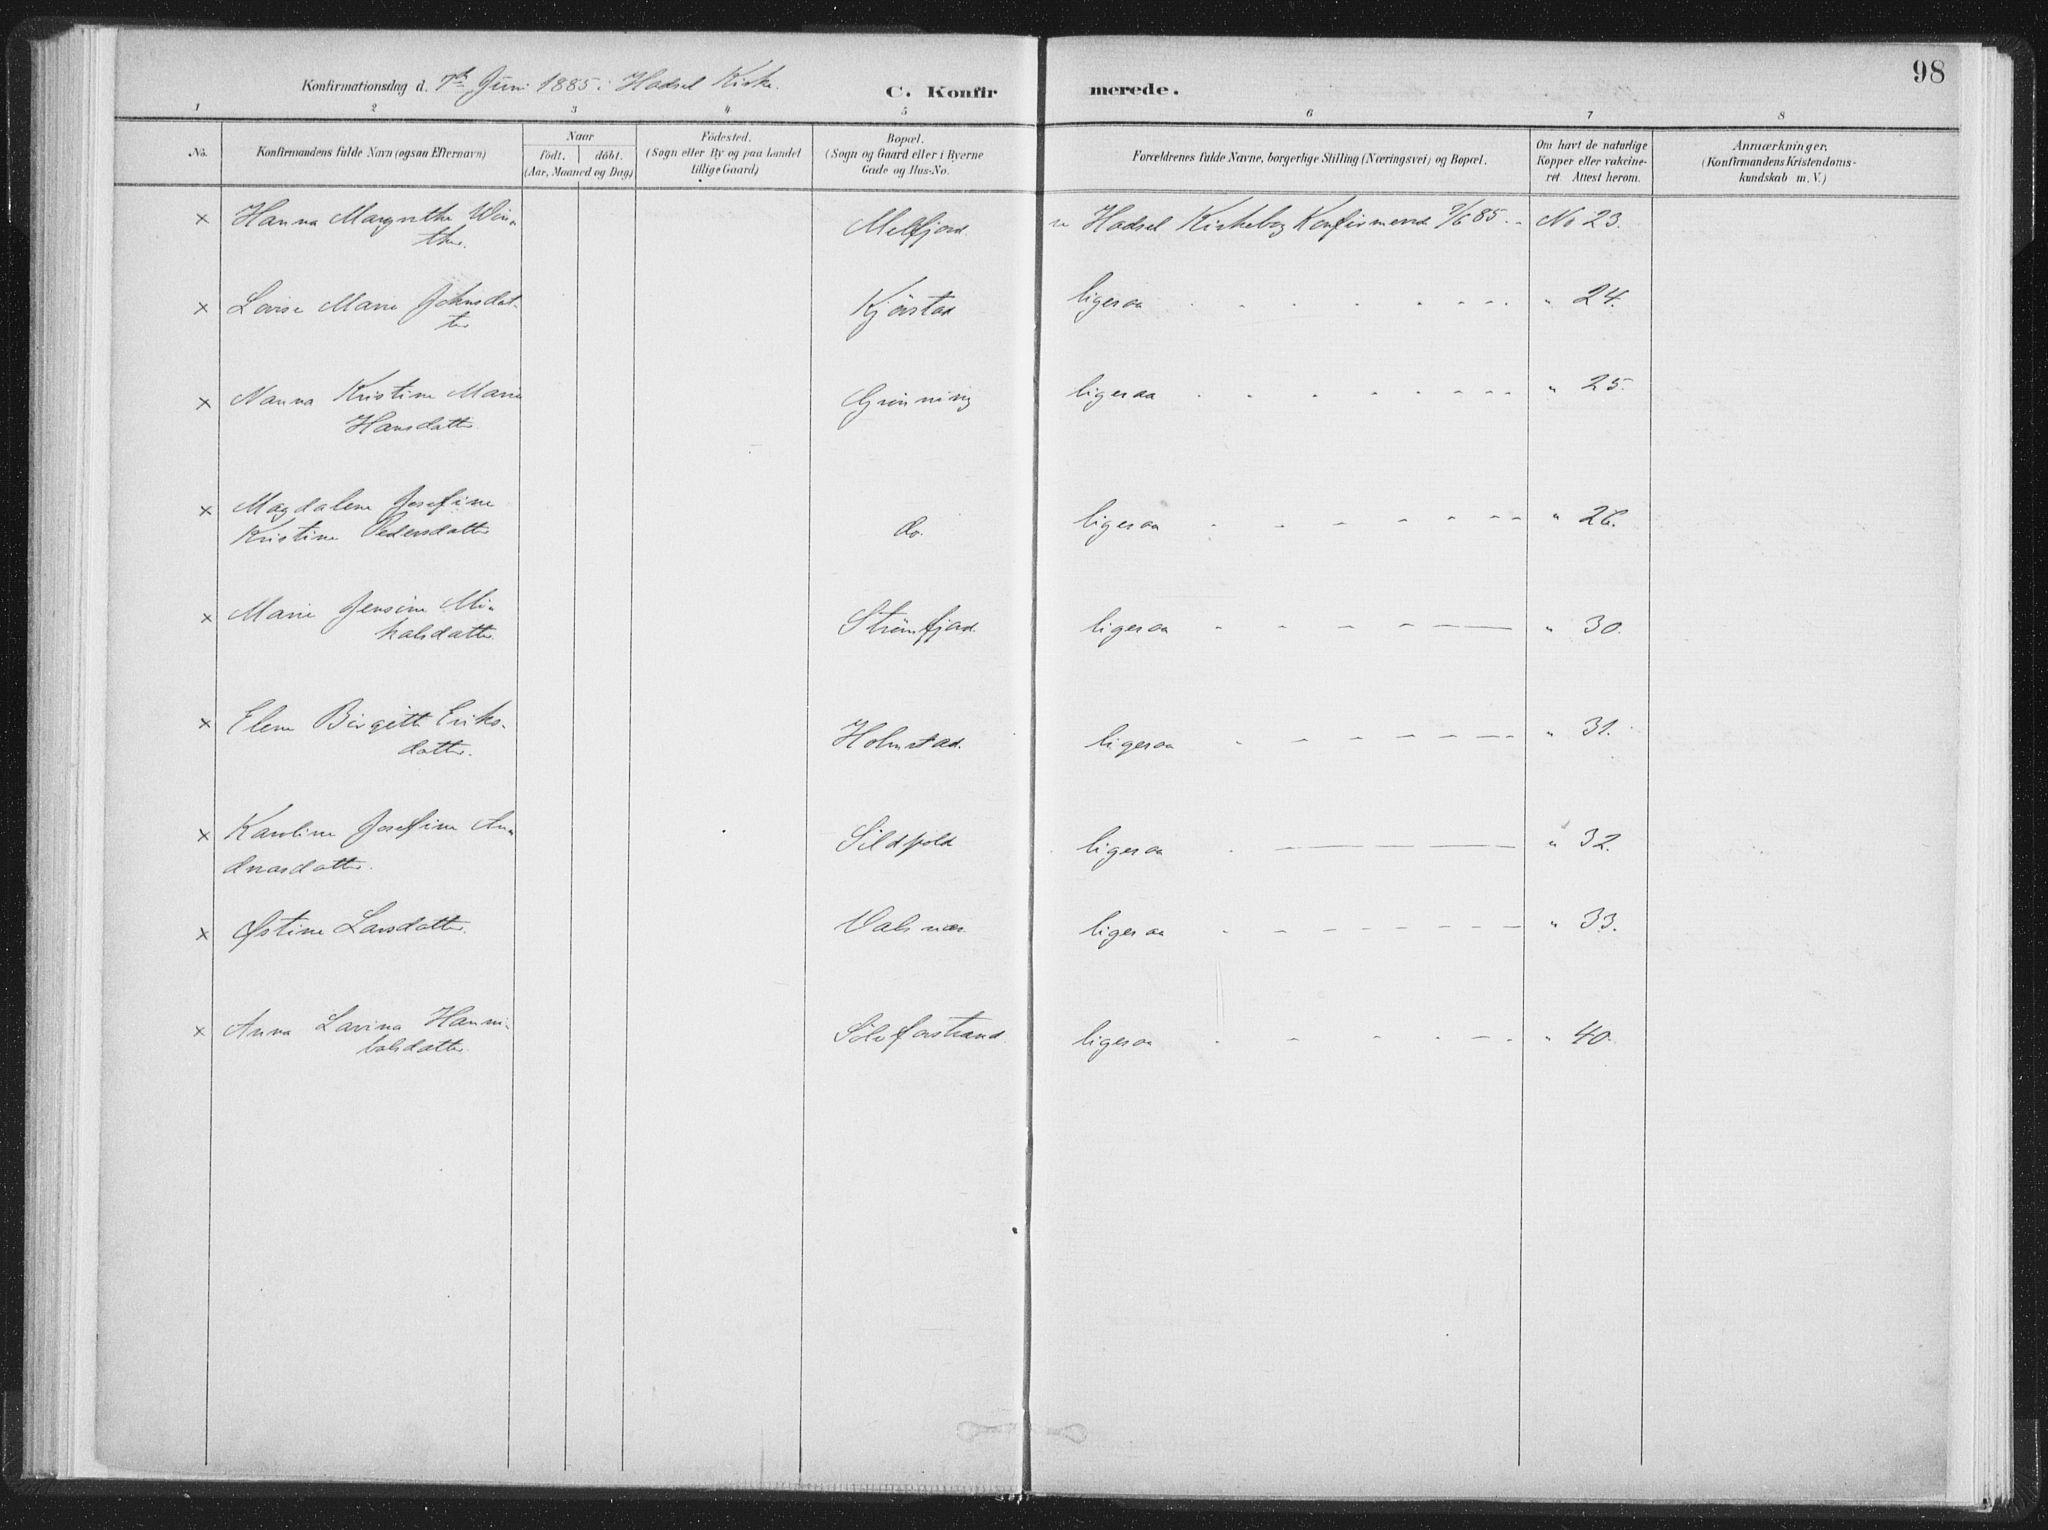 SAT, Ministerialprotokoller, klokkerbøker og fødselsregistre - Nordland, 890/L1286: Ministerialbok nr. 890A01, 1882-1902, s. 98